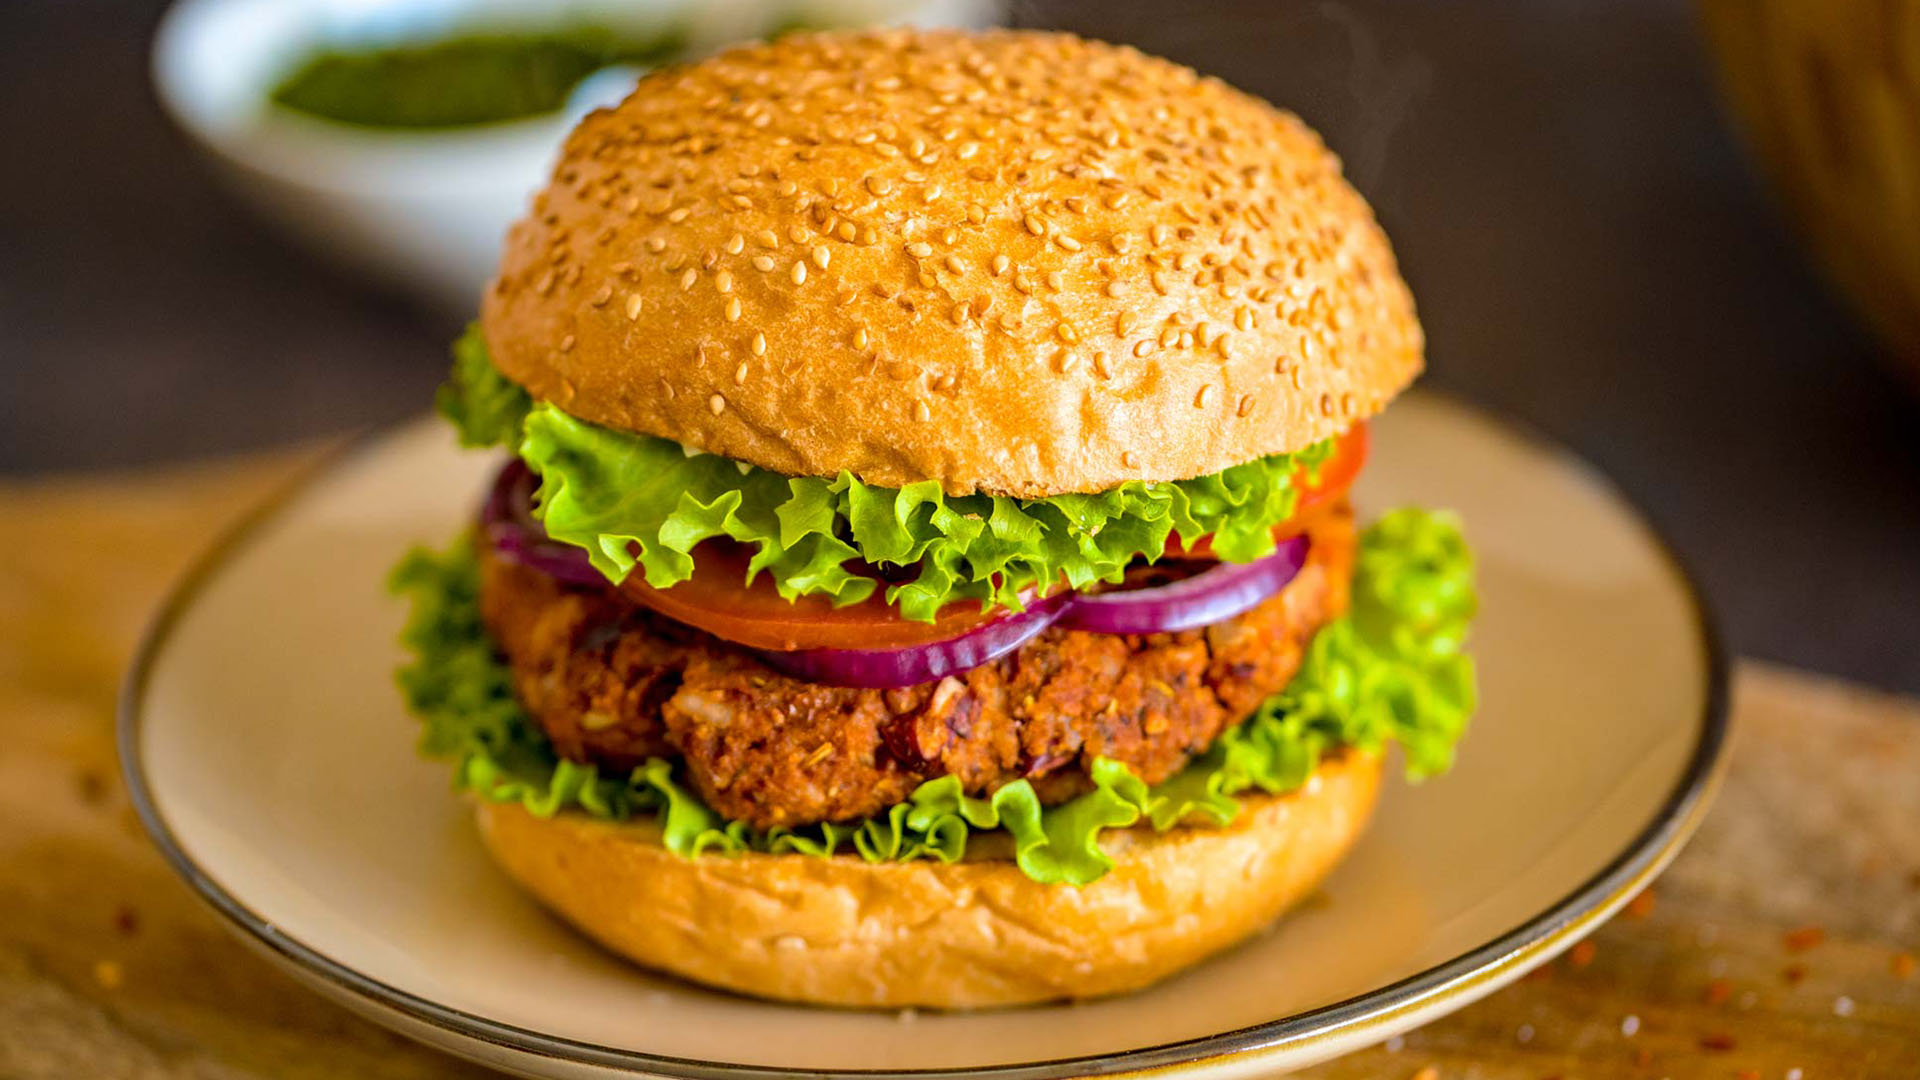 Studentski recepti: Veganski burger